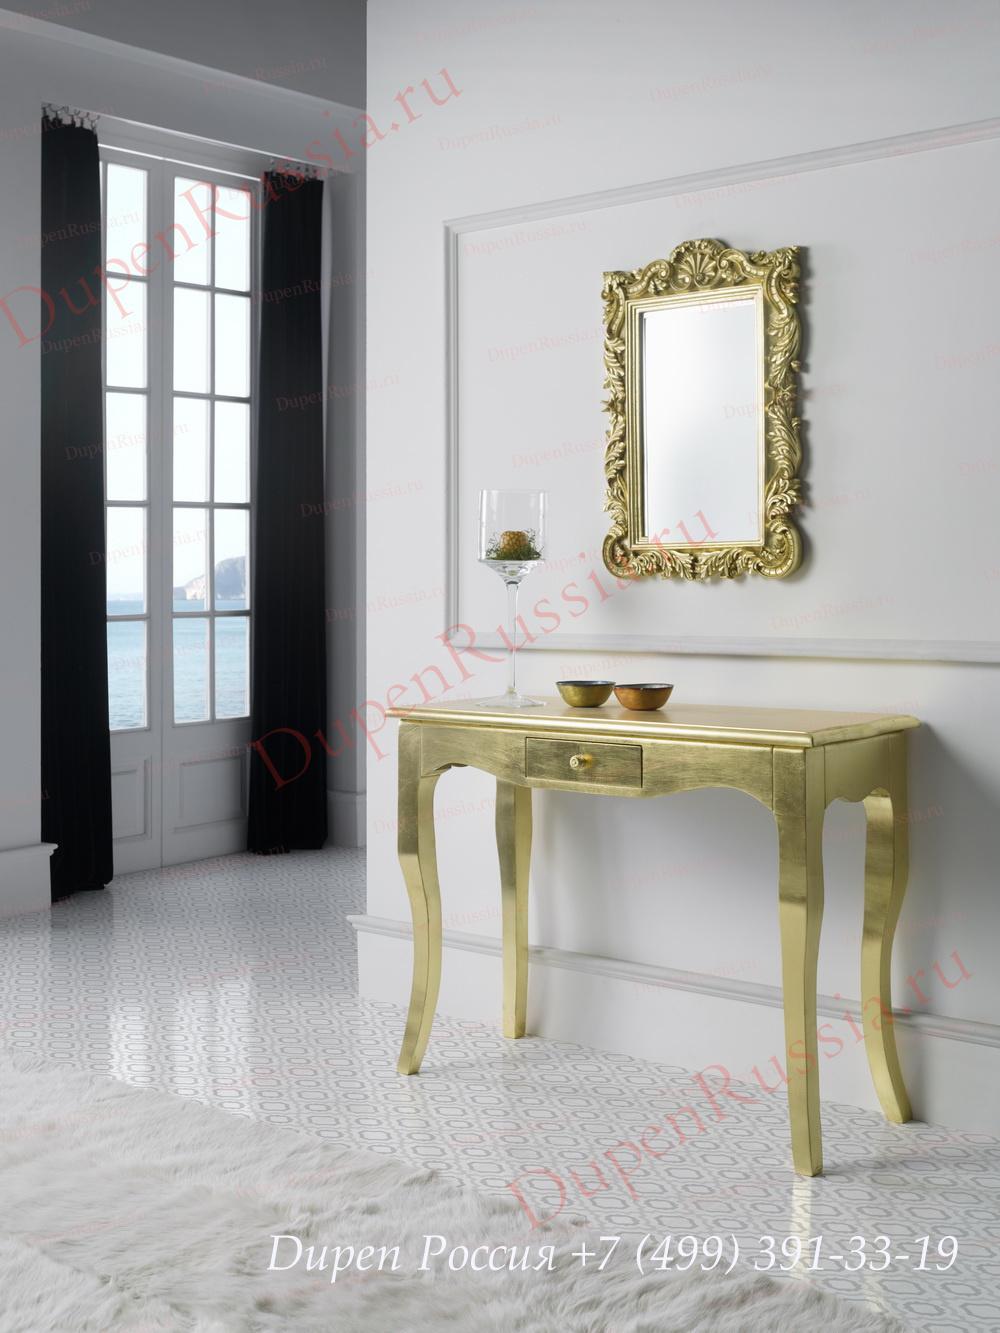 Зеркало DUPEN (Дюпен) PU001 золото, консоль Dupen K59